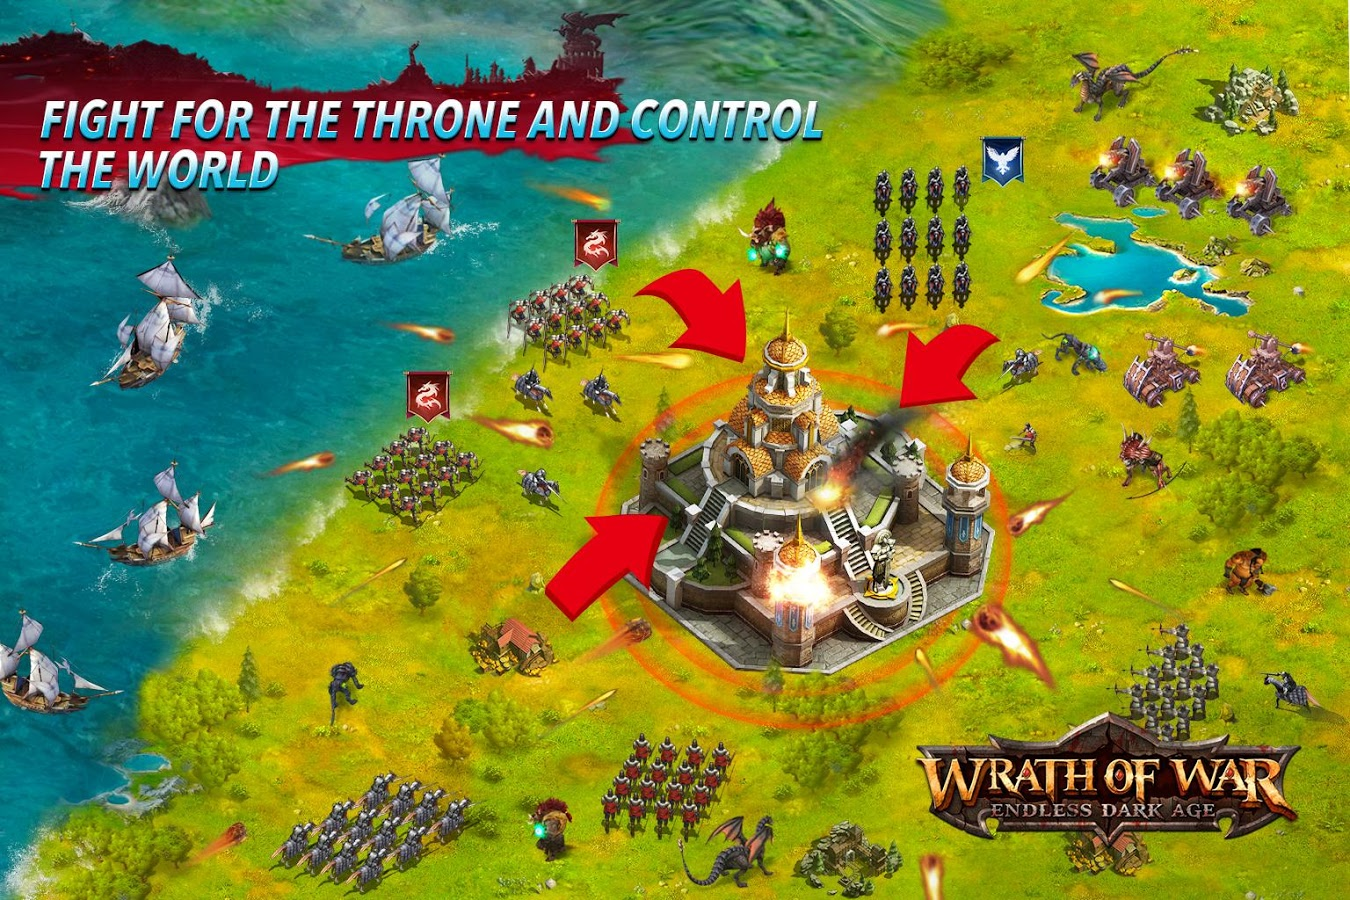 Wrath-Of-War-Endless-Dark-Age-mod-apk-hack